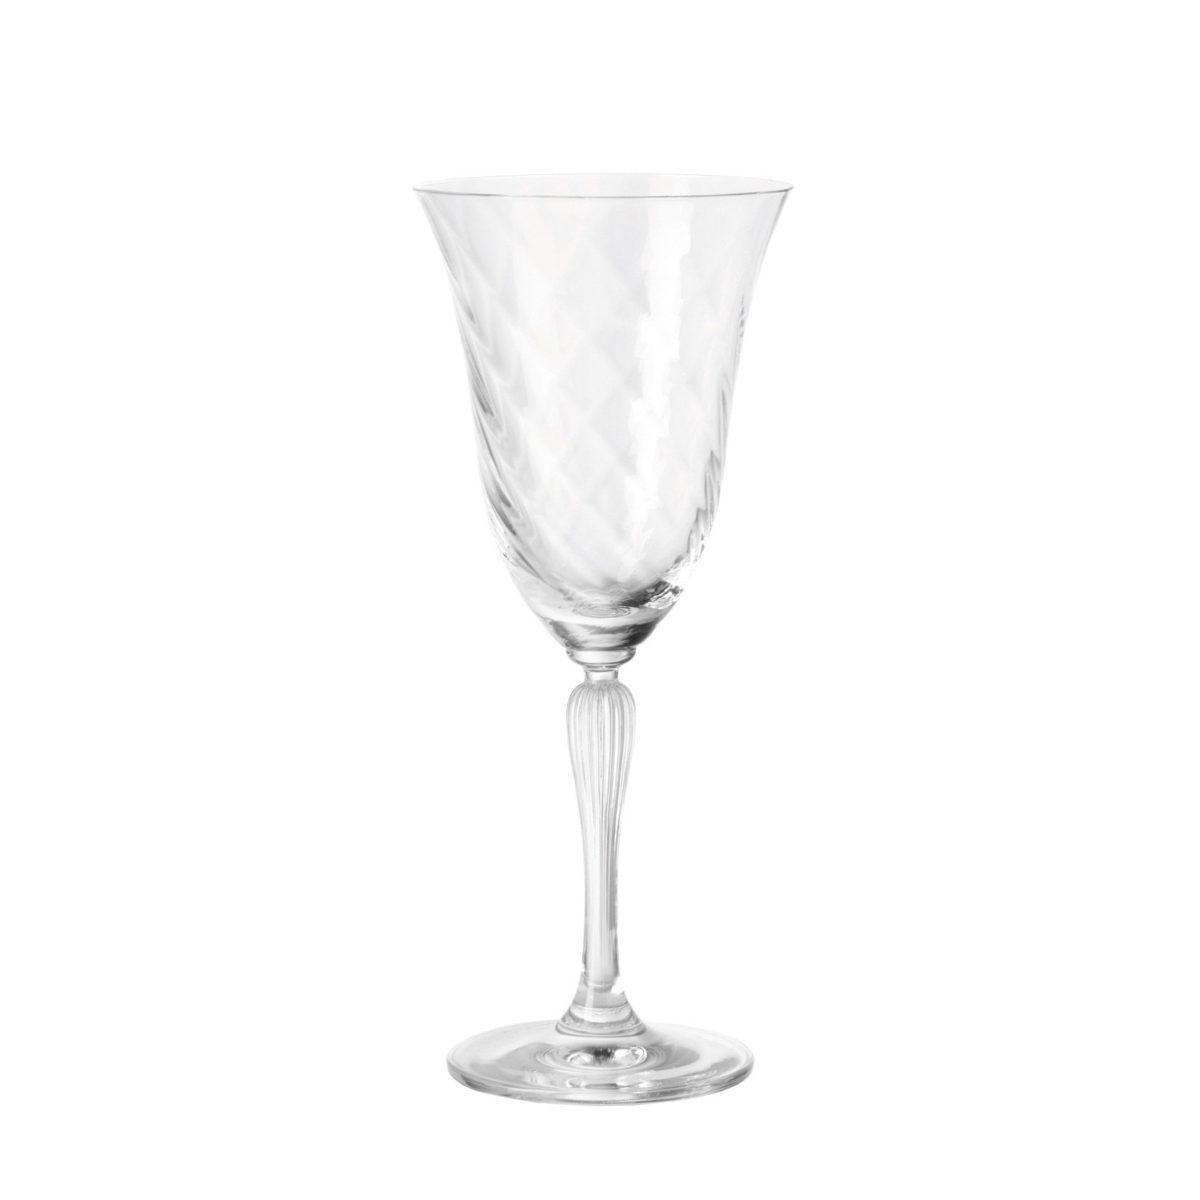 020765 0 k 1200x1200 - Pahar pentru vin roșu Volterra 280 ml (L020765)